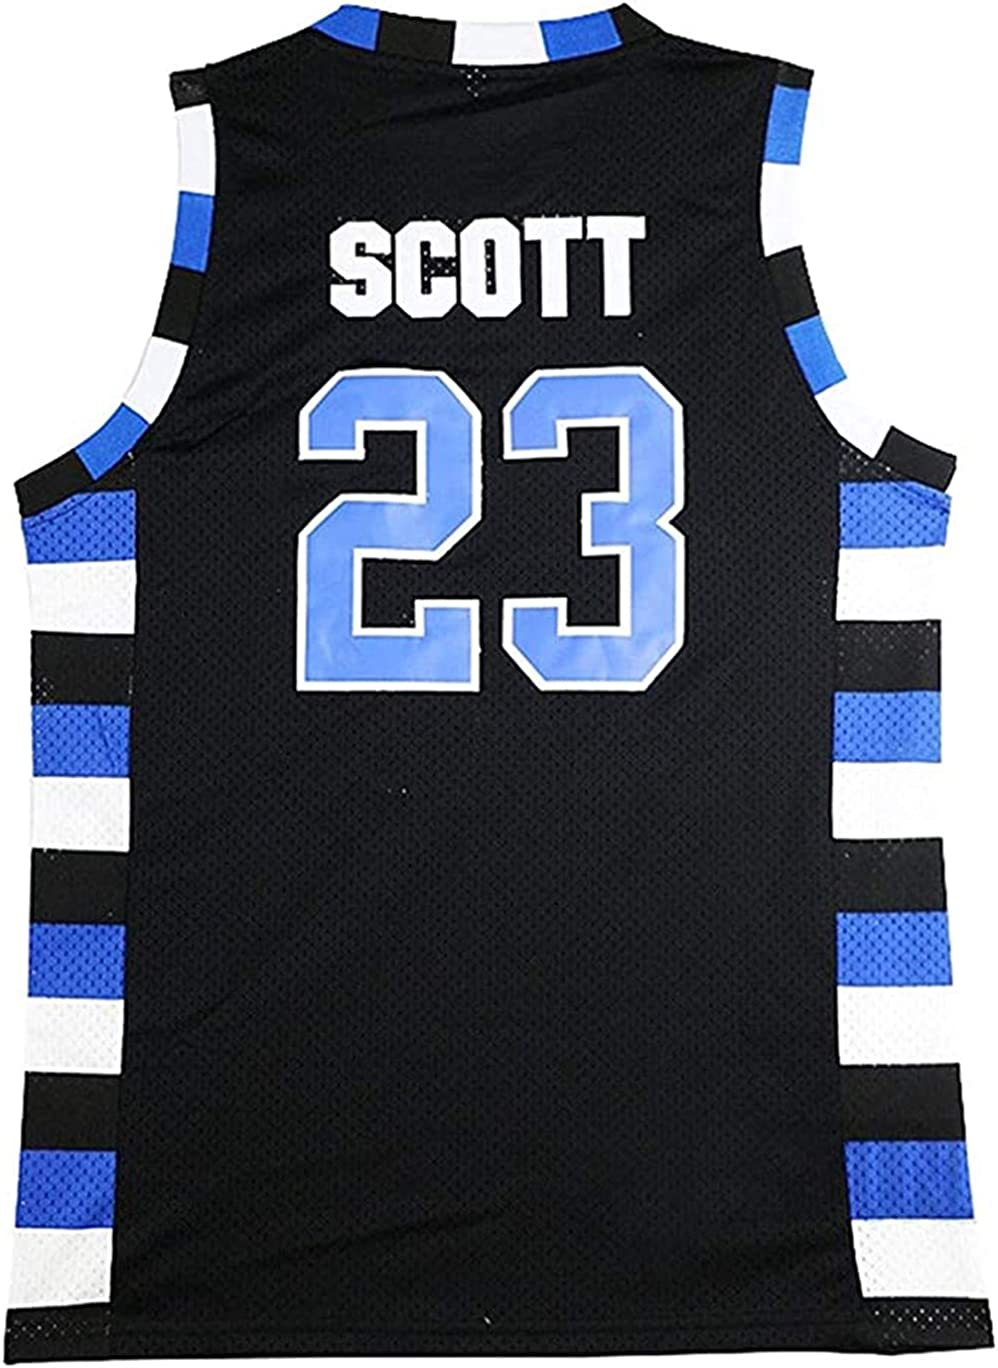 Mens Ravens Lucas Scott #3 Basketball Jersey #23 Nathan Scott Sports Movie Jersey Black